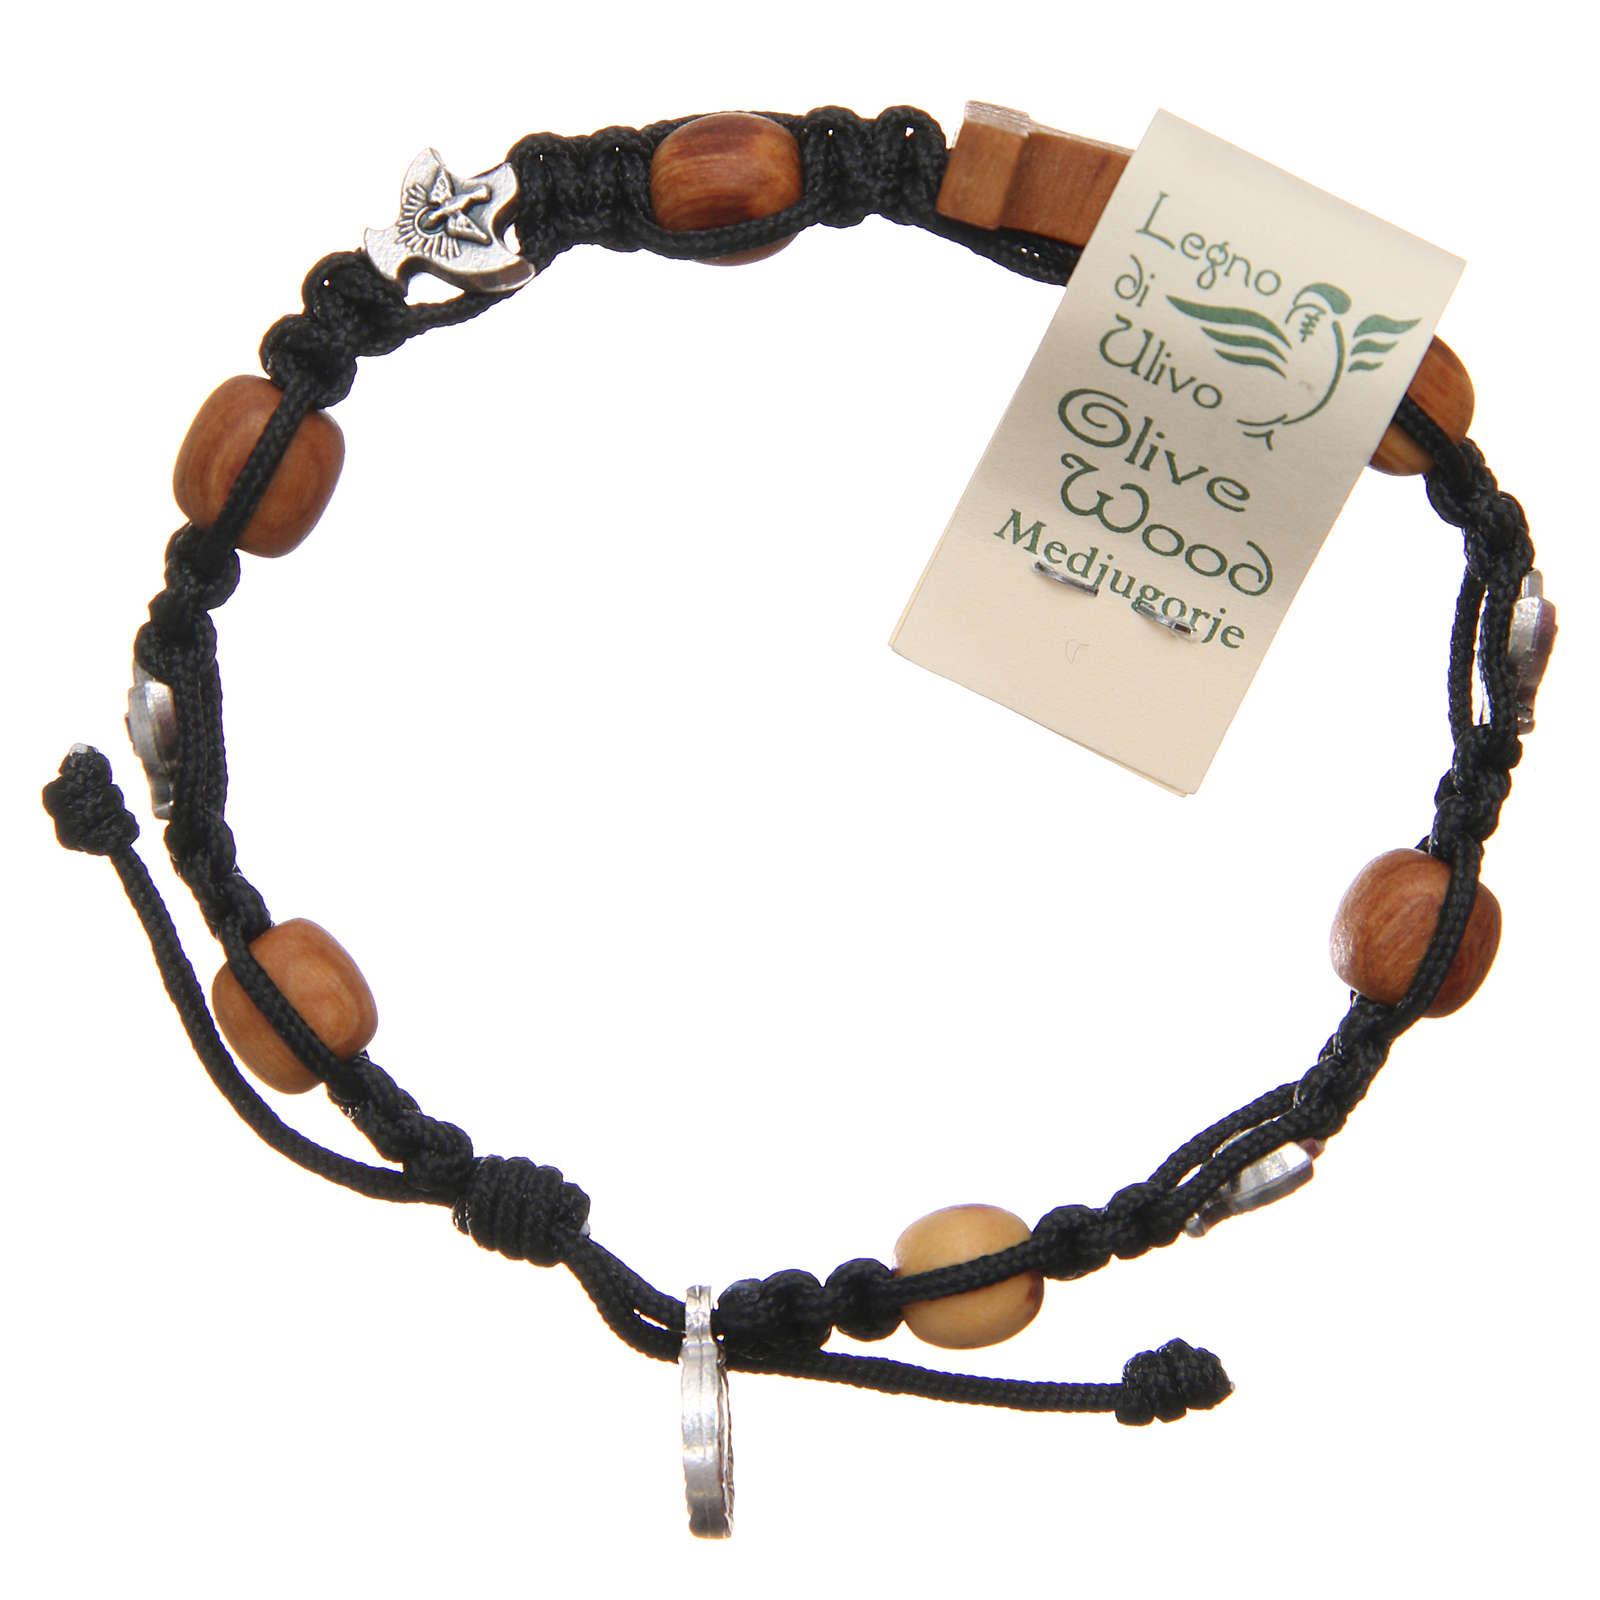 Olive wood bracelet Saint Benedict cross, 10mm beads 4